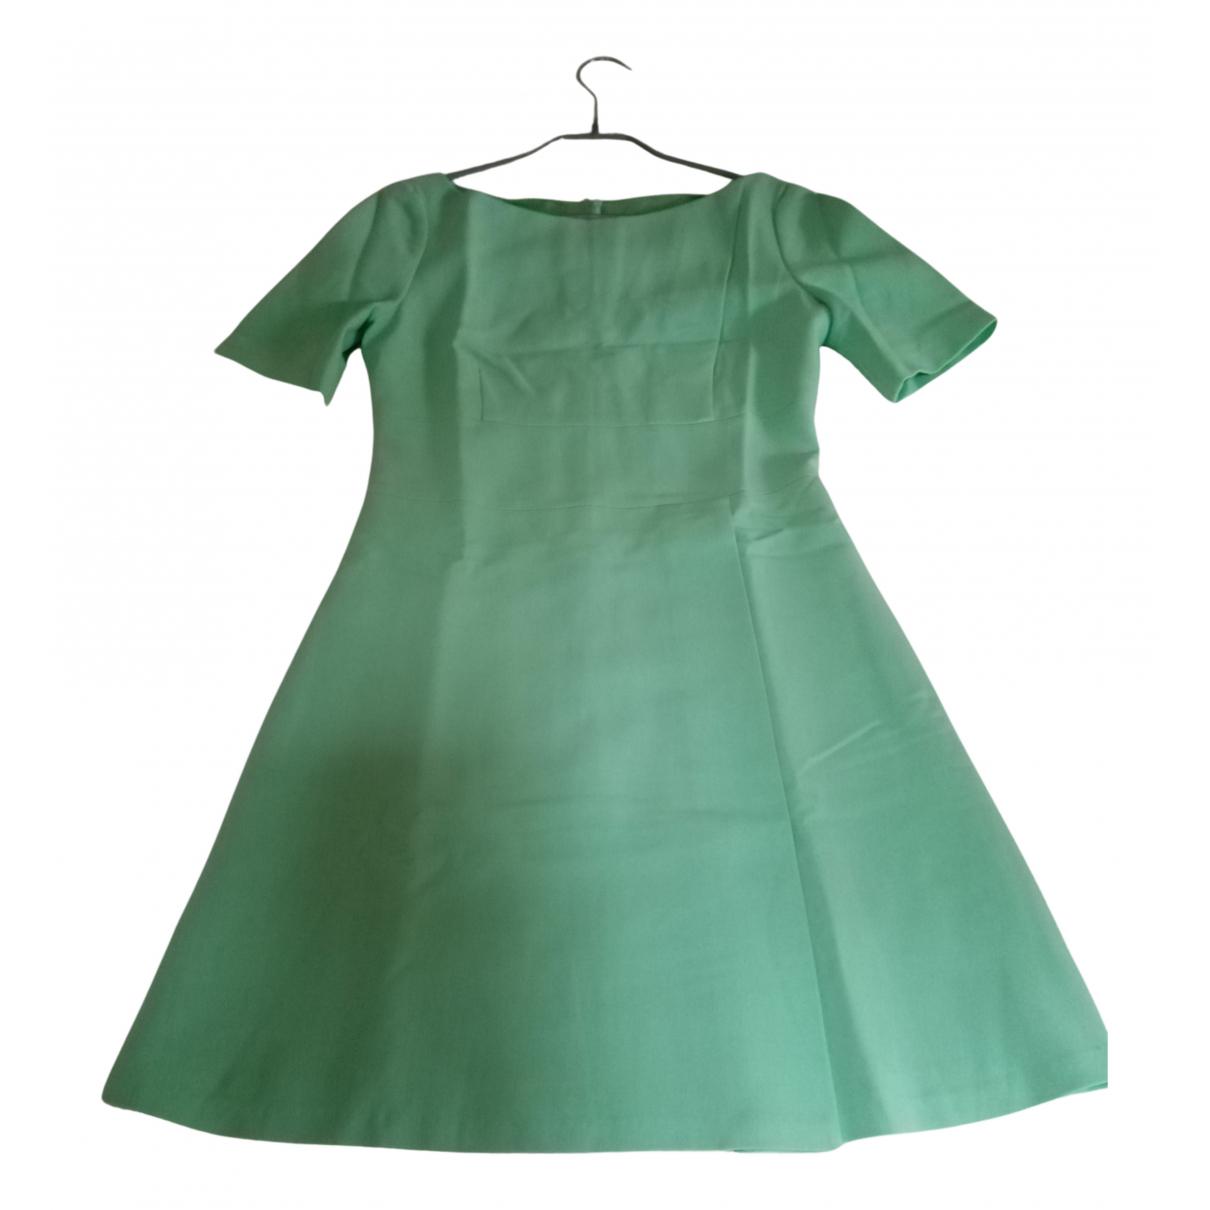 Tara Jarmon \N Kleid in  Gruen Polyester